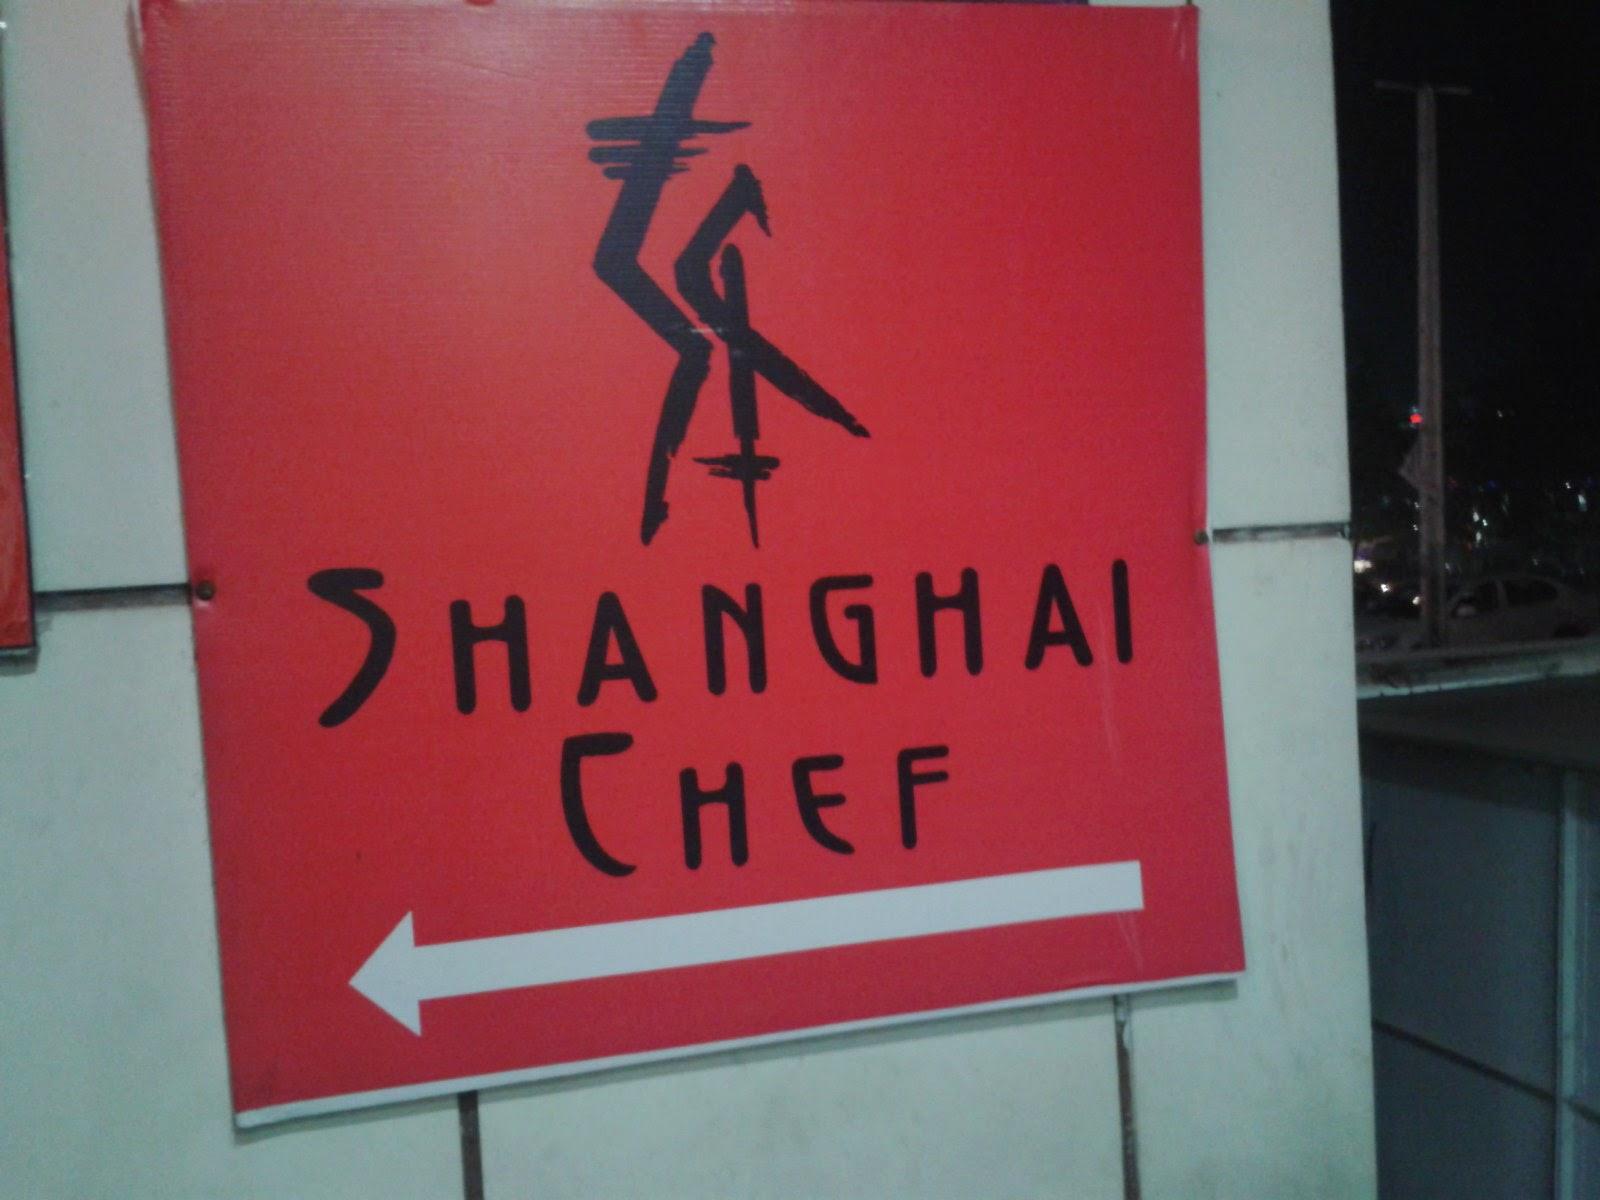 Shanghai Chef